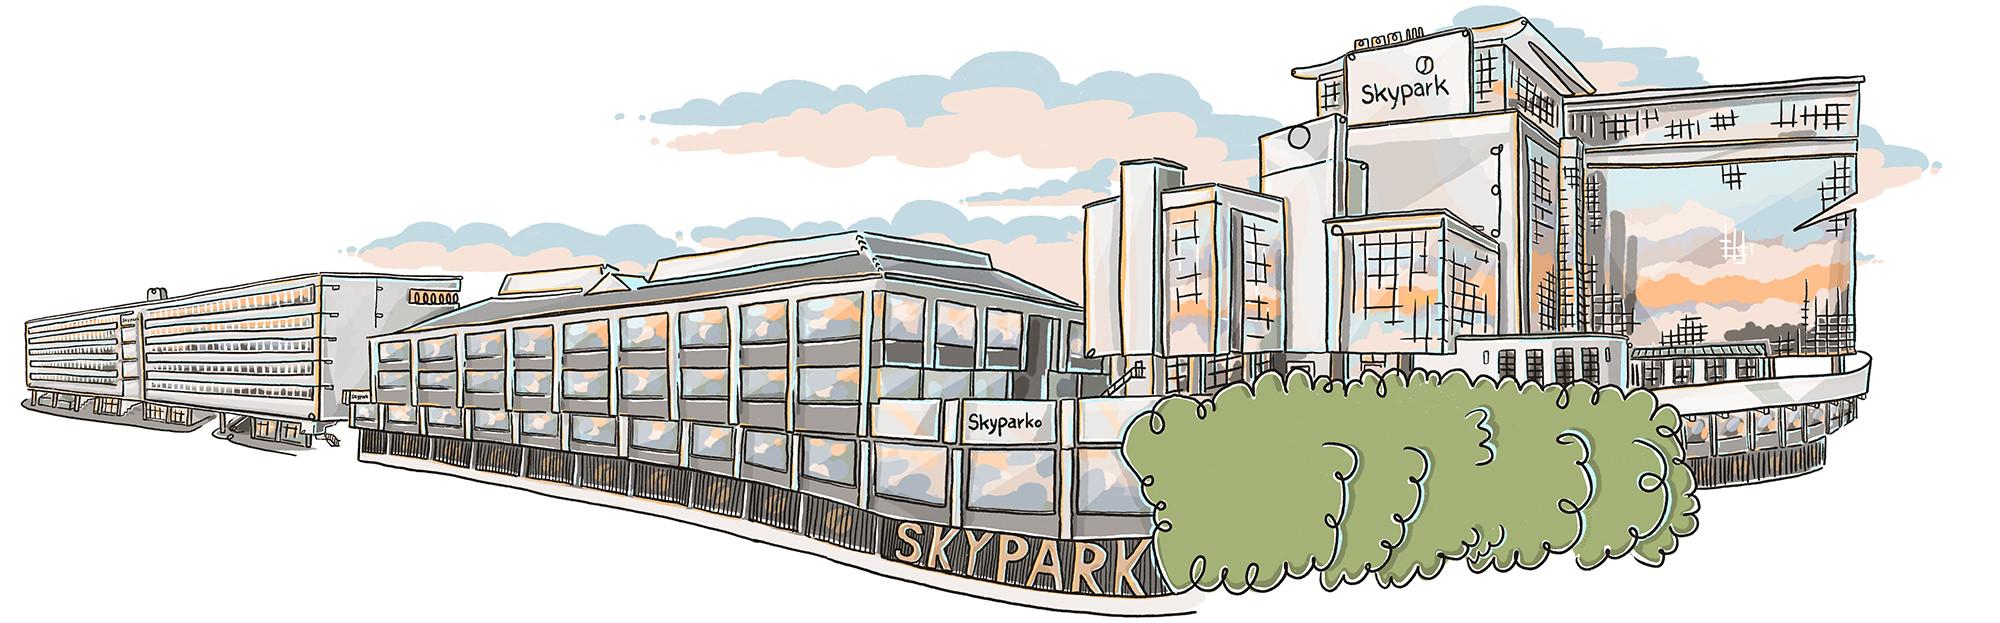 Skypark building 1-6, Glasgow | ©Ida Henrich